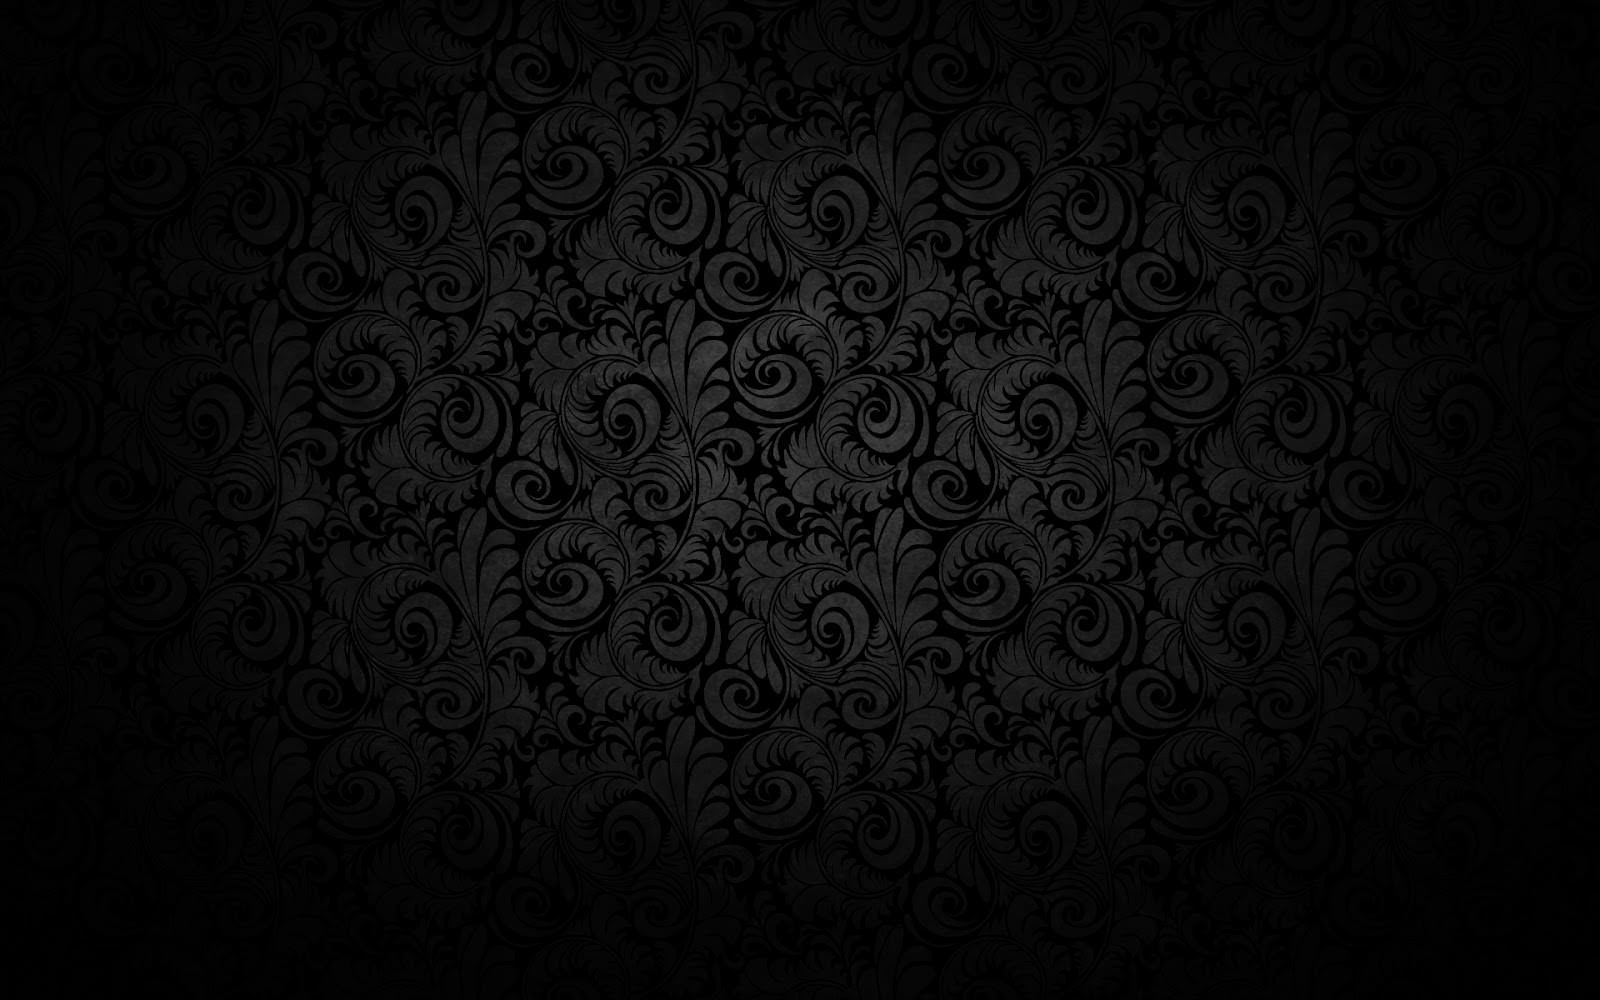 dark background grey floral pattern hd texture image free download